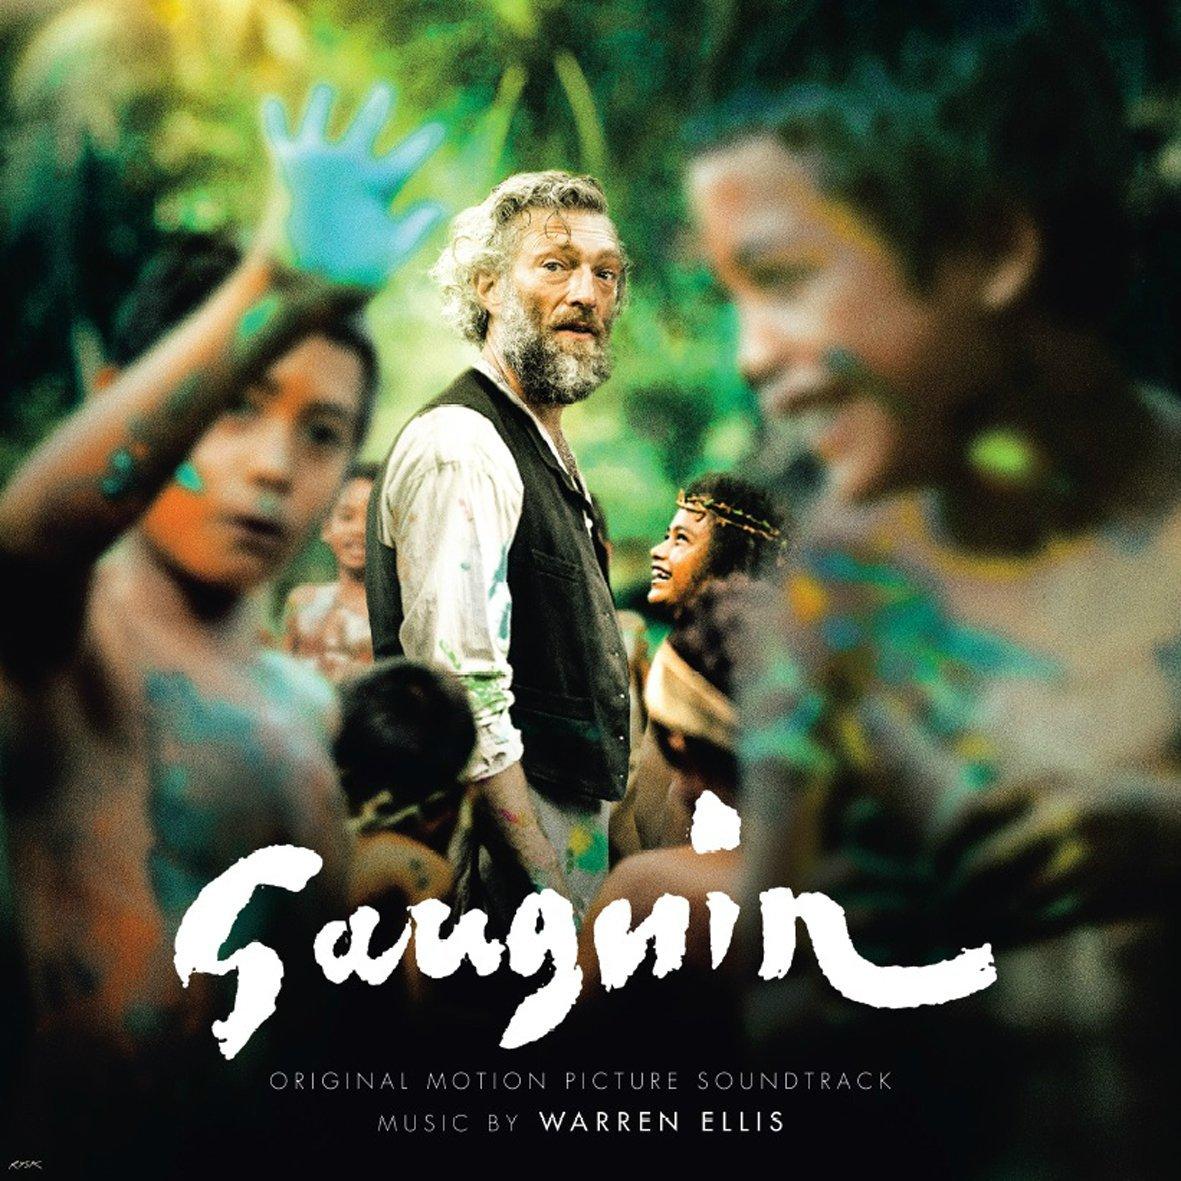 Gauguin, Detalles del álbum